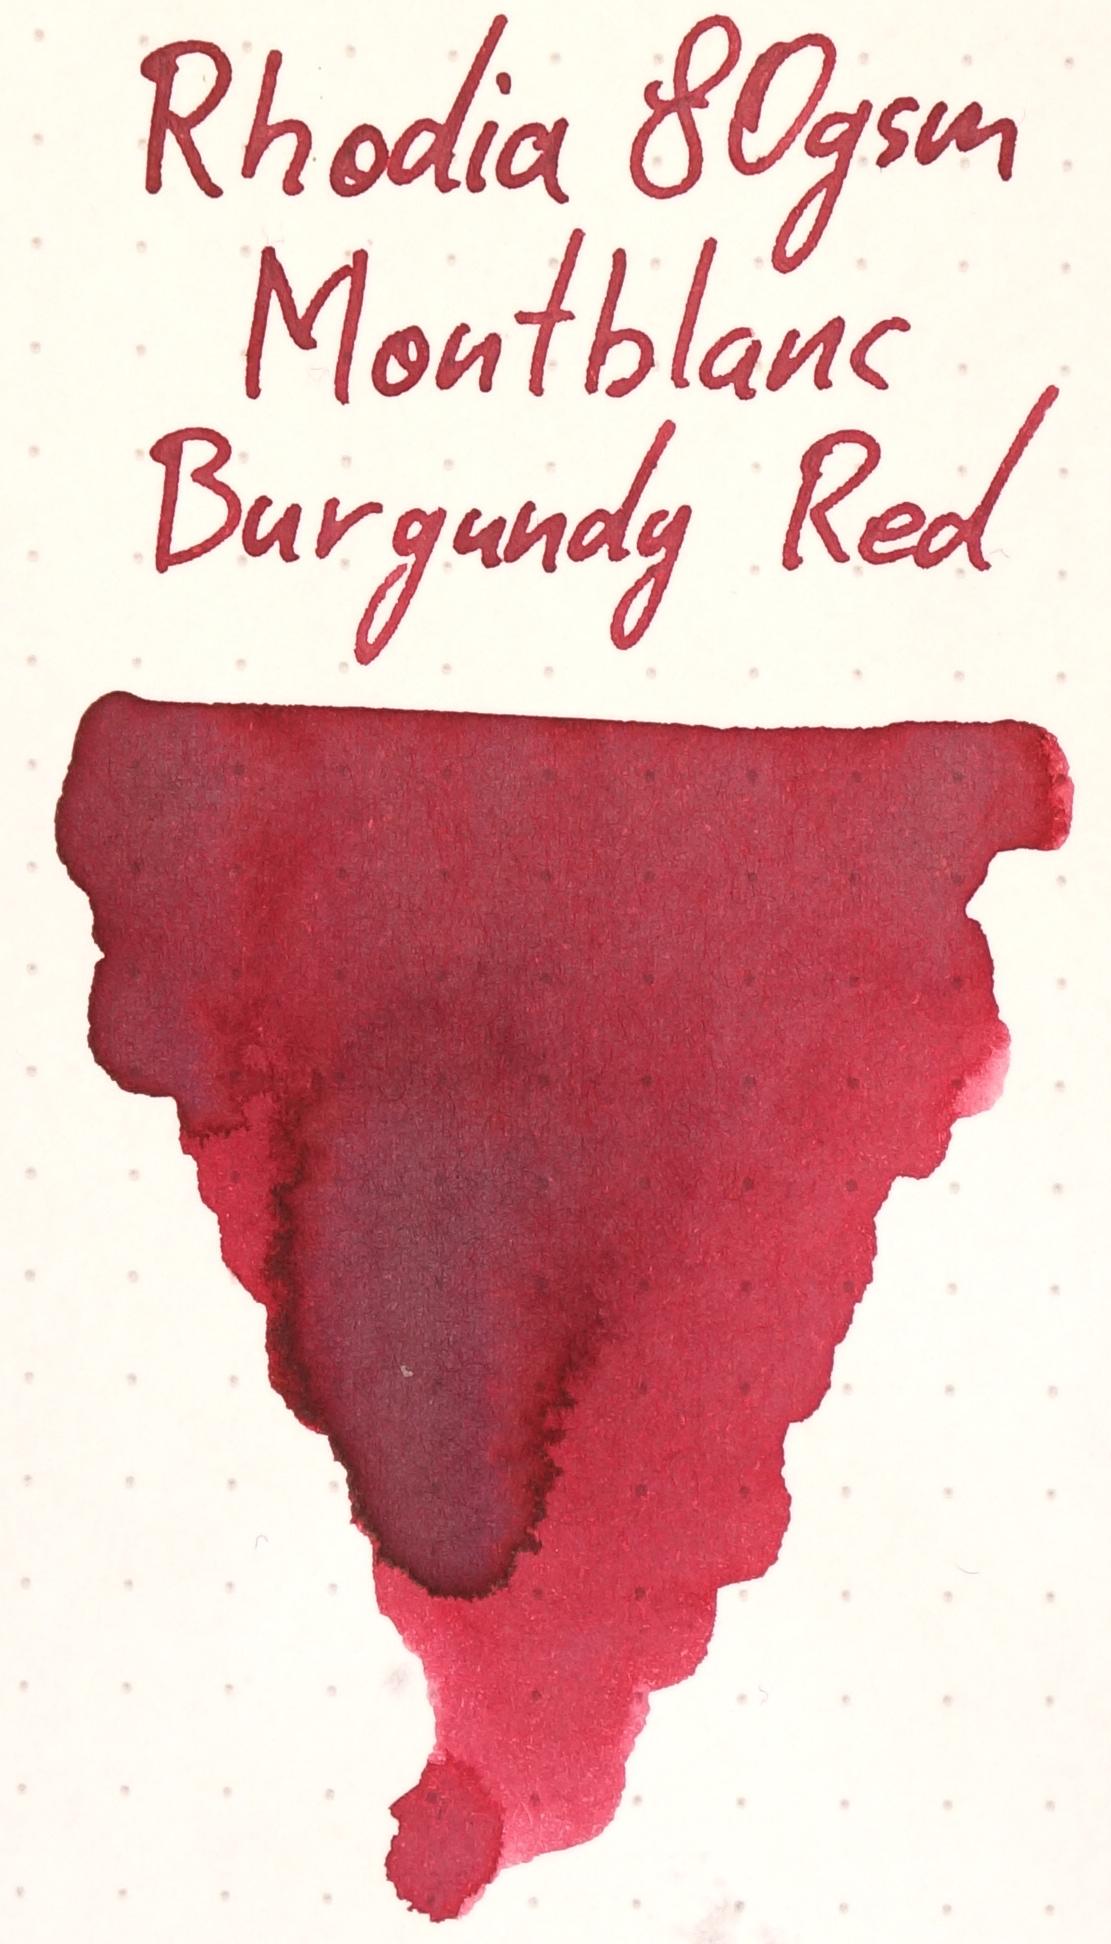 Montblanc Burgundy Red Rhodia.JPG